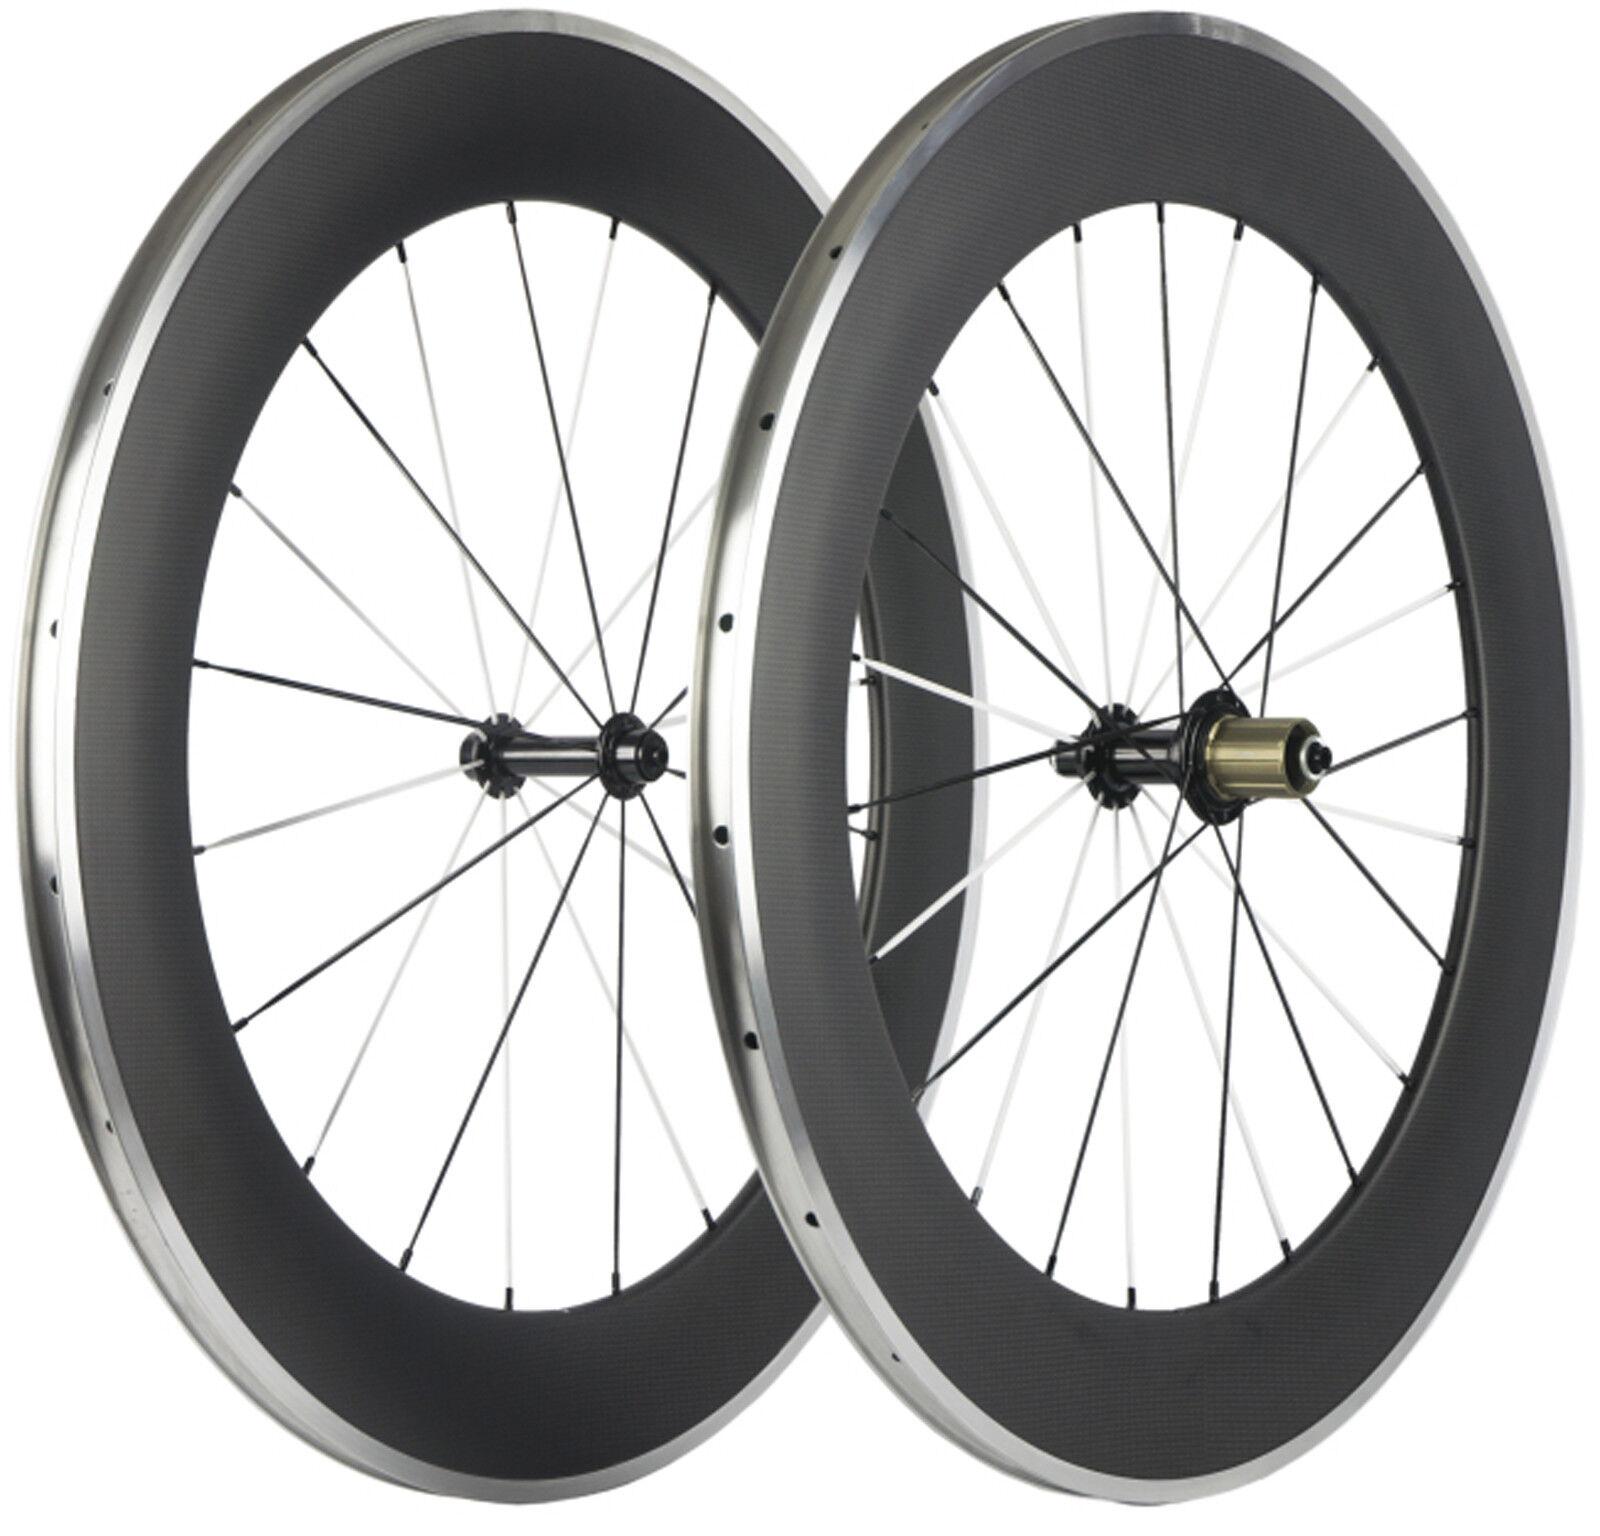 Aluminum Braking Wheels 88mm Clincher Road Bike Wheelset Bicycle 23mm Width 700C